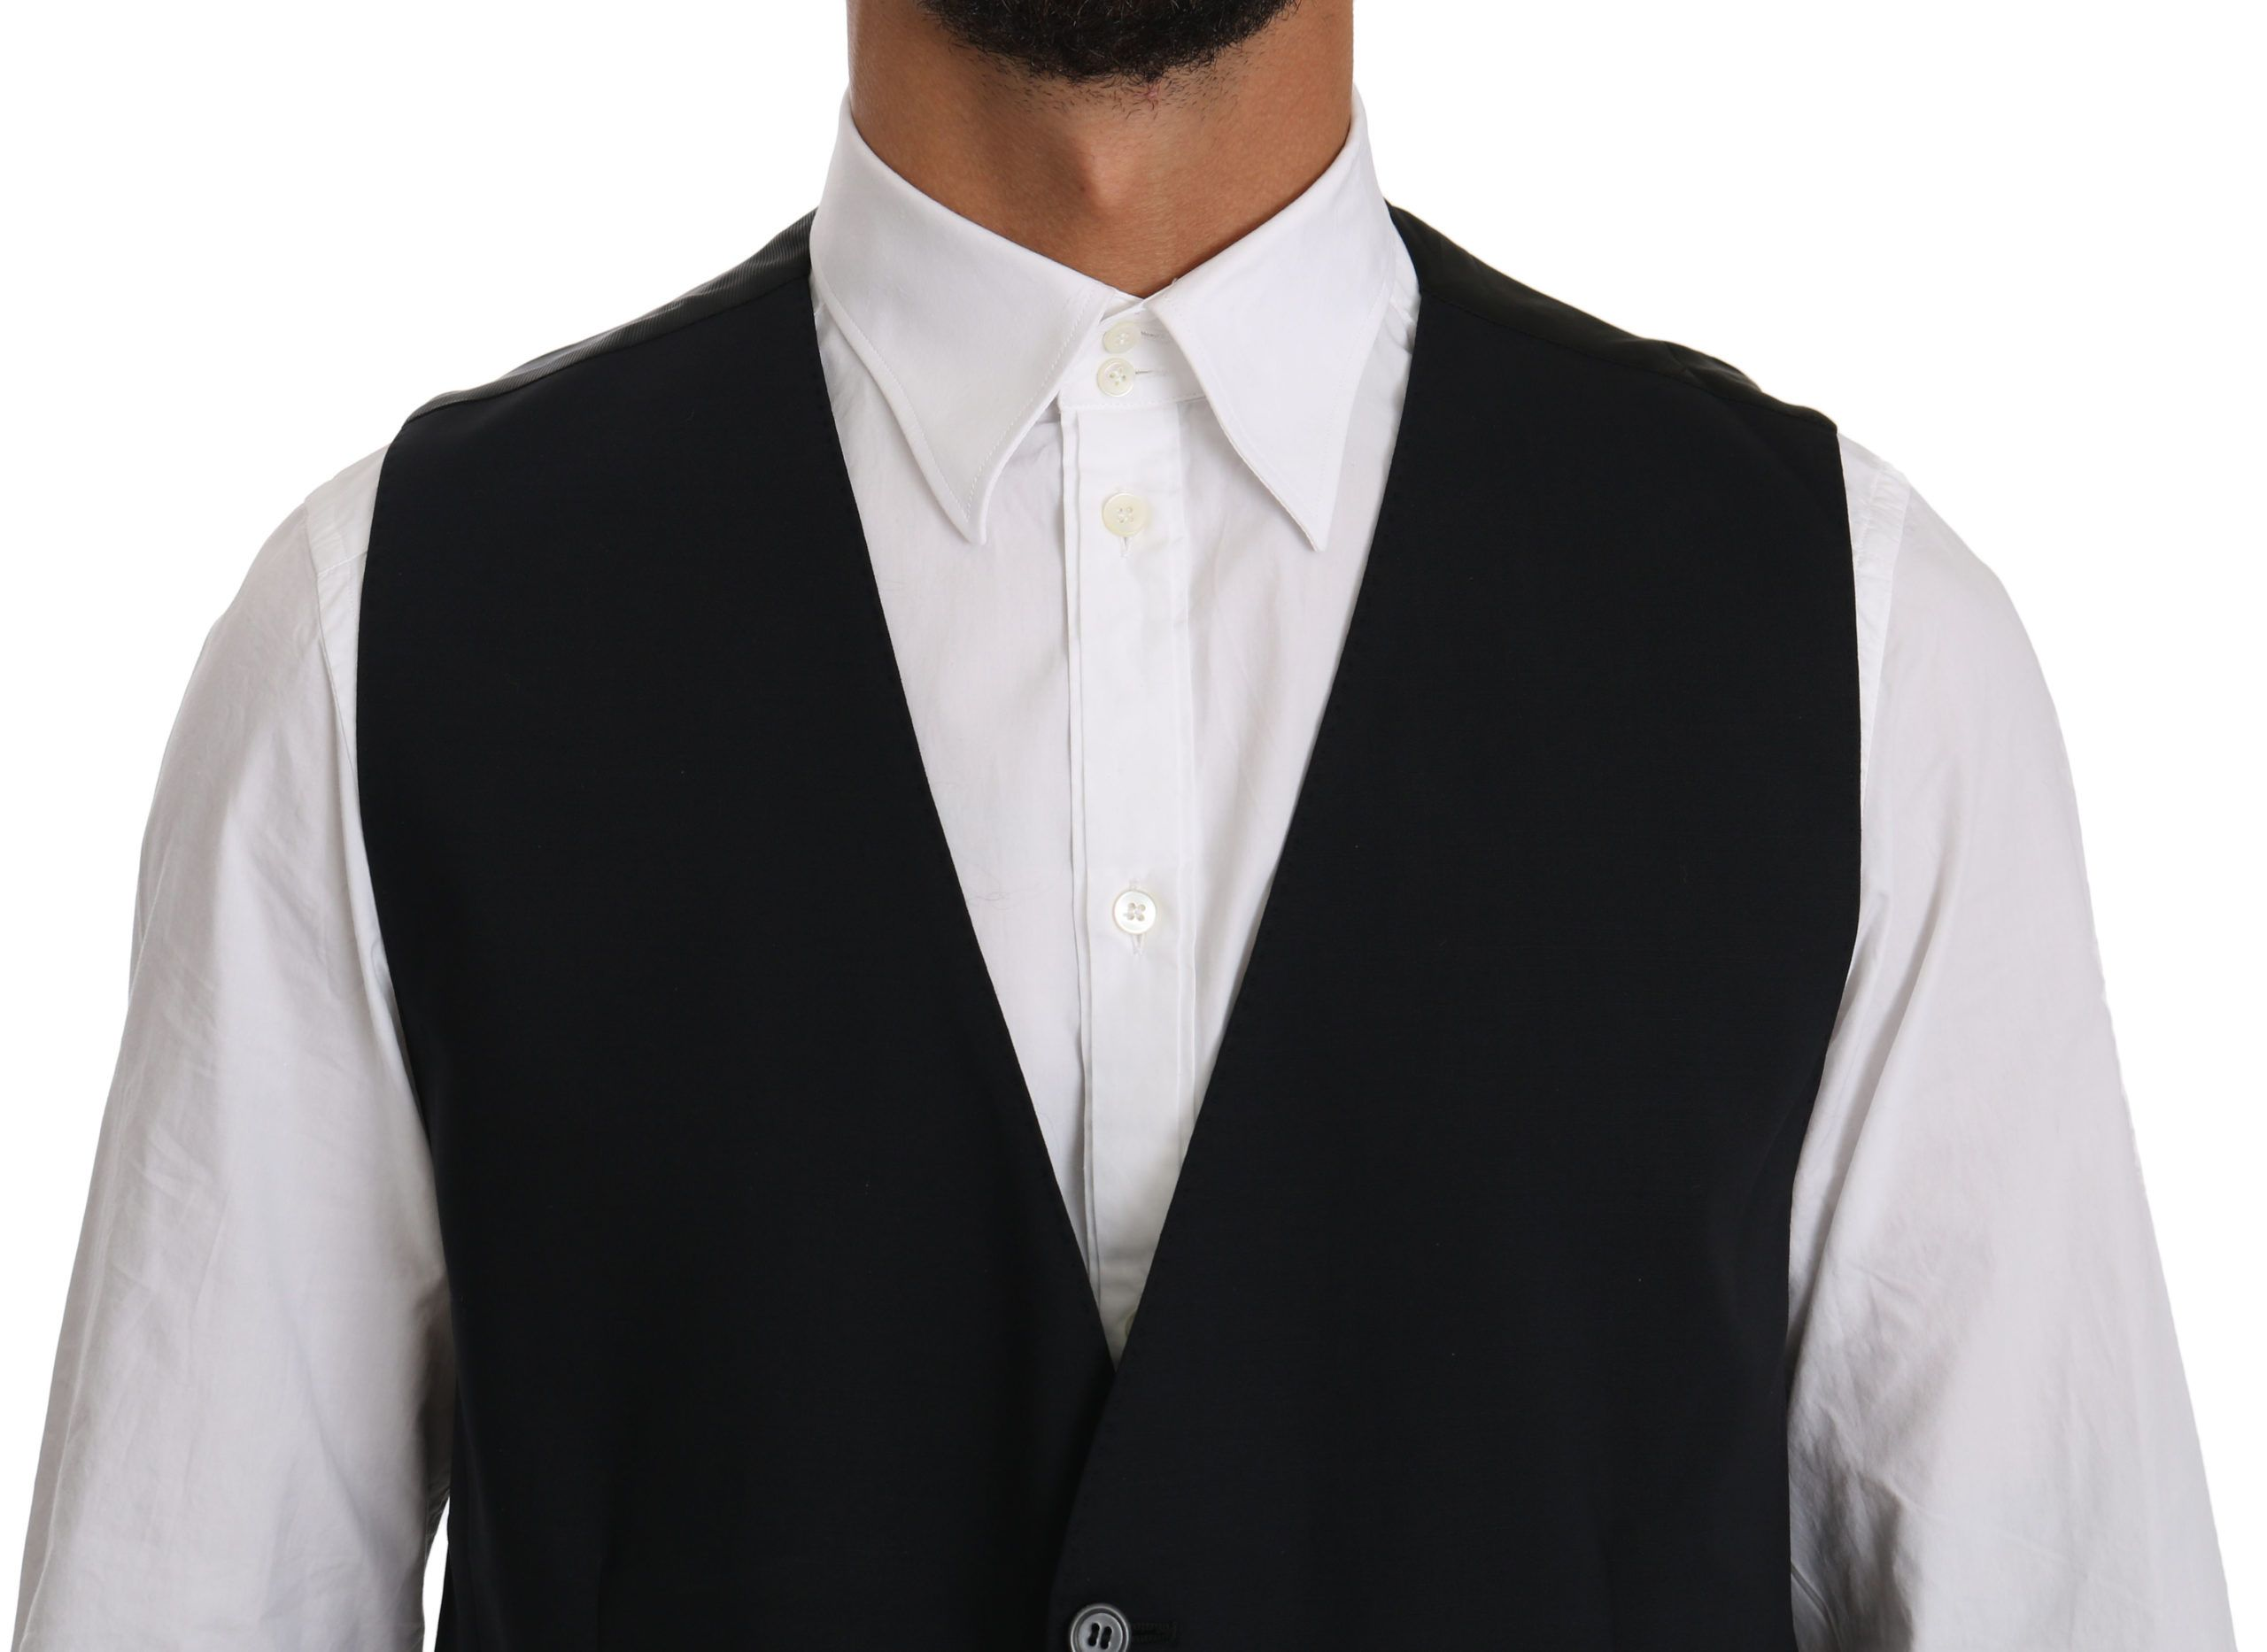 Dolce & Gabbana Black Waistcoat Formal Gilet Cotton Vest